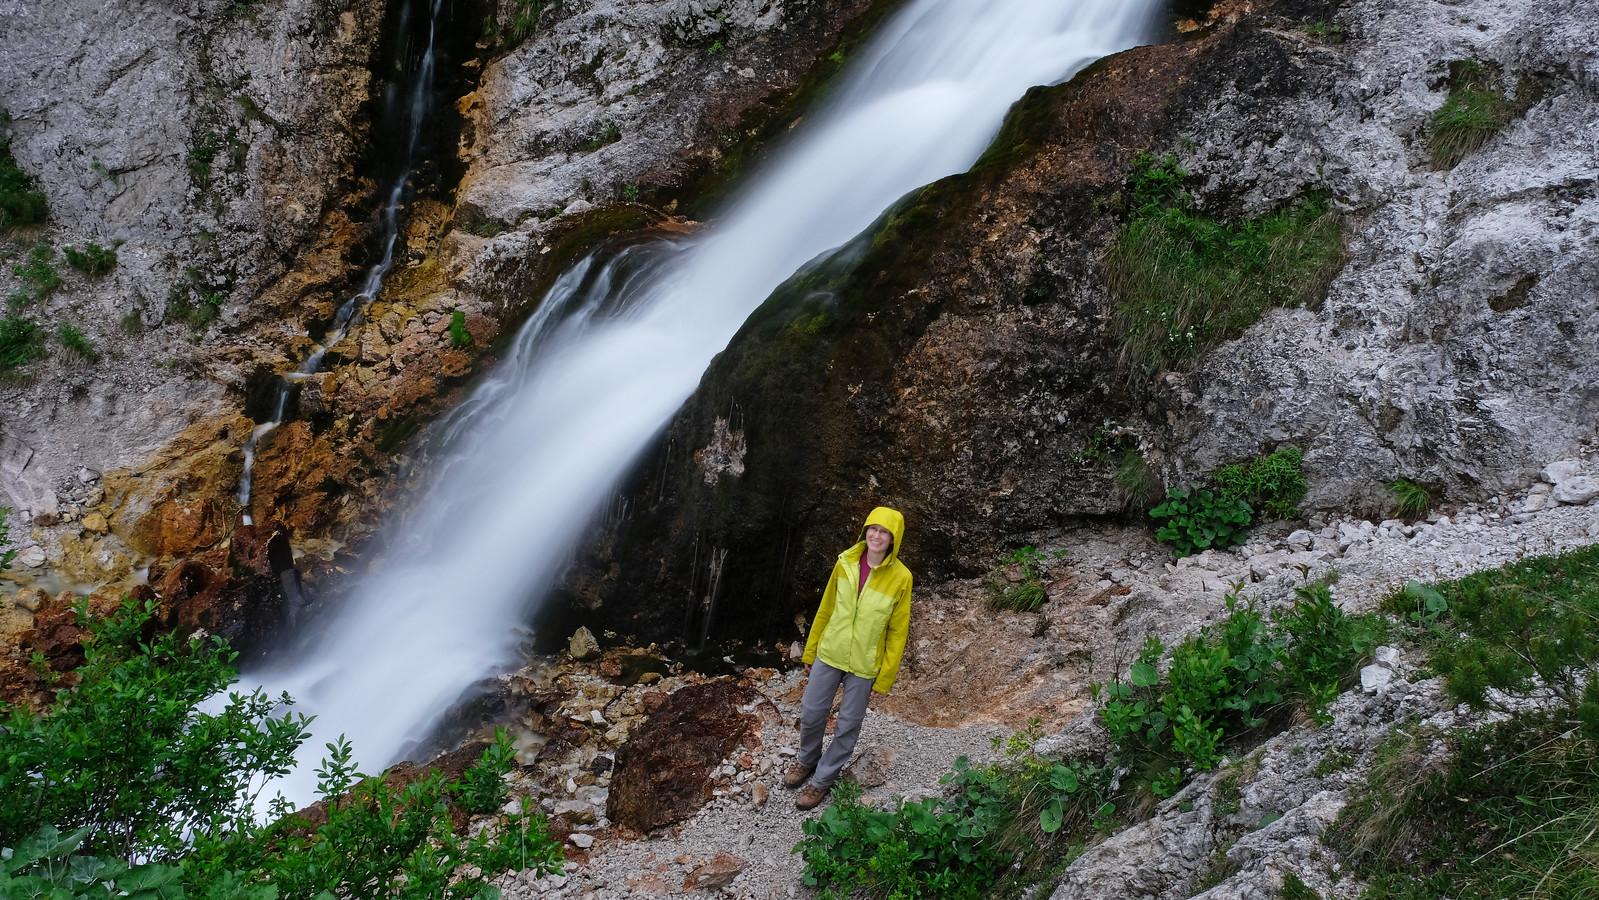 Nadiža waterfall, Slovenia